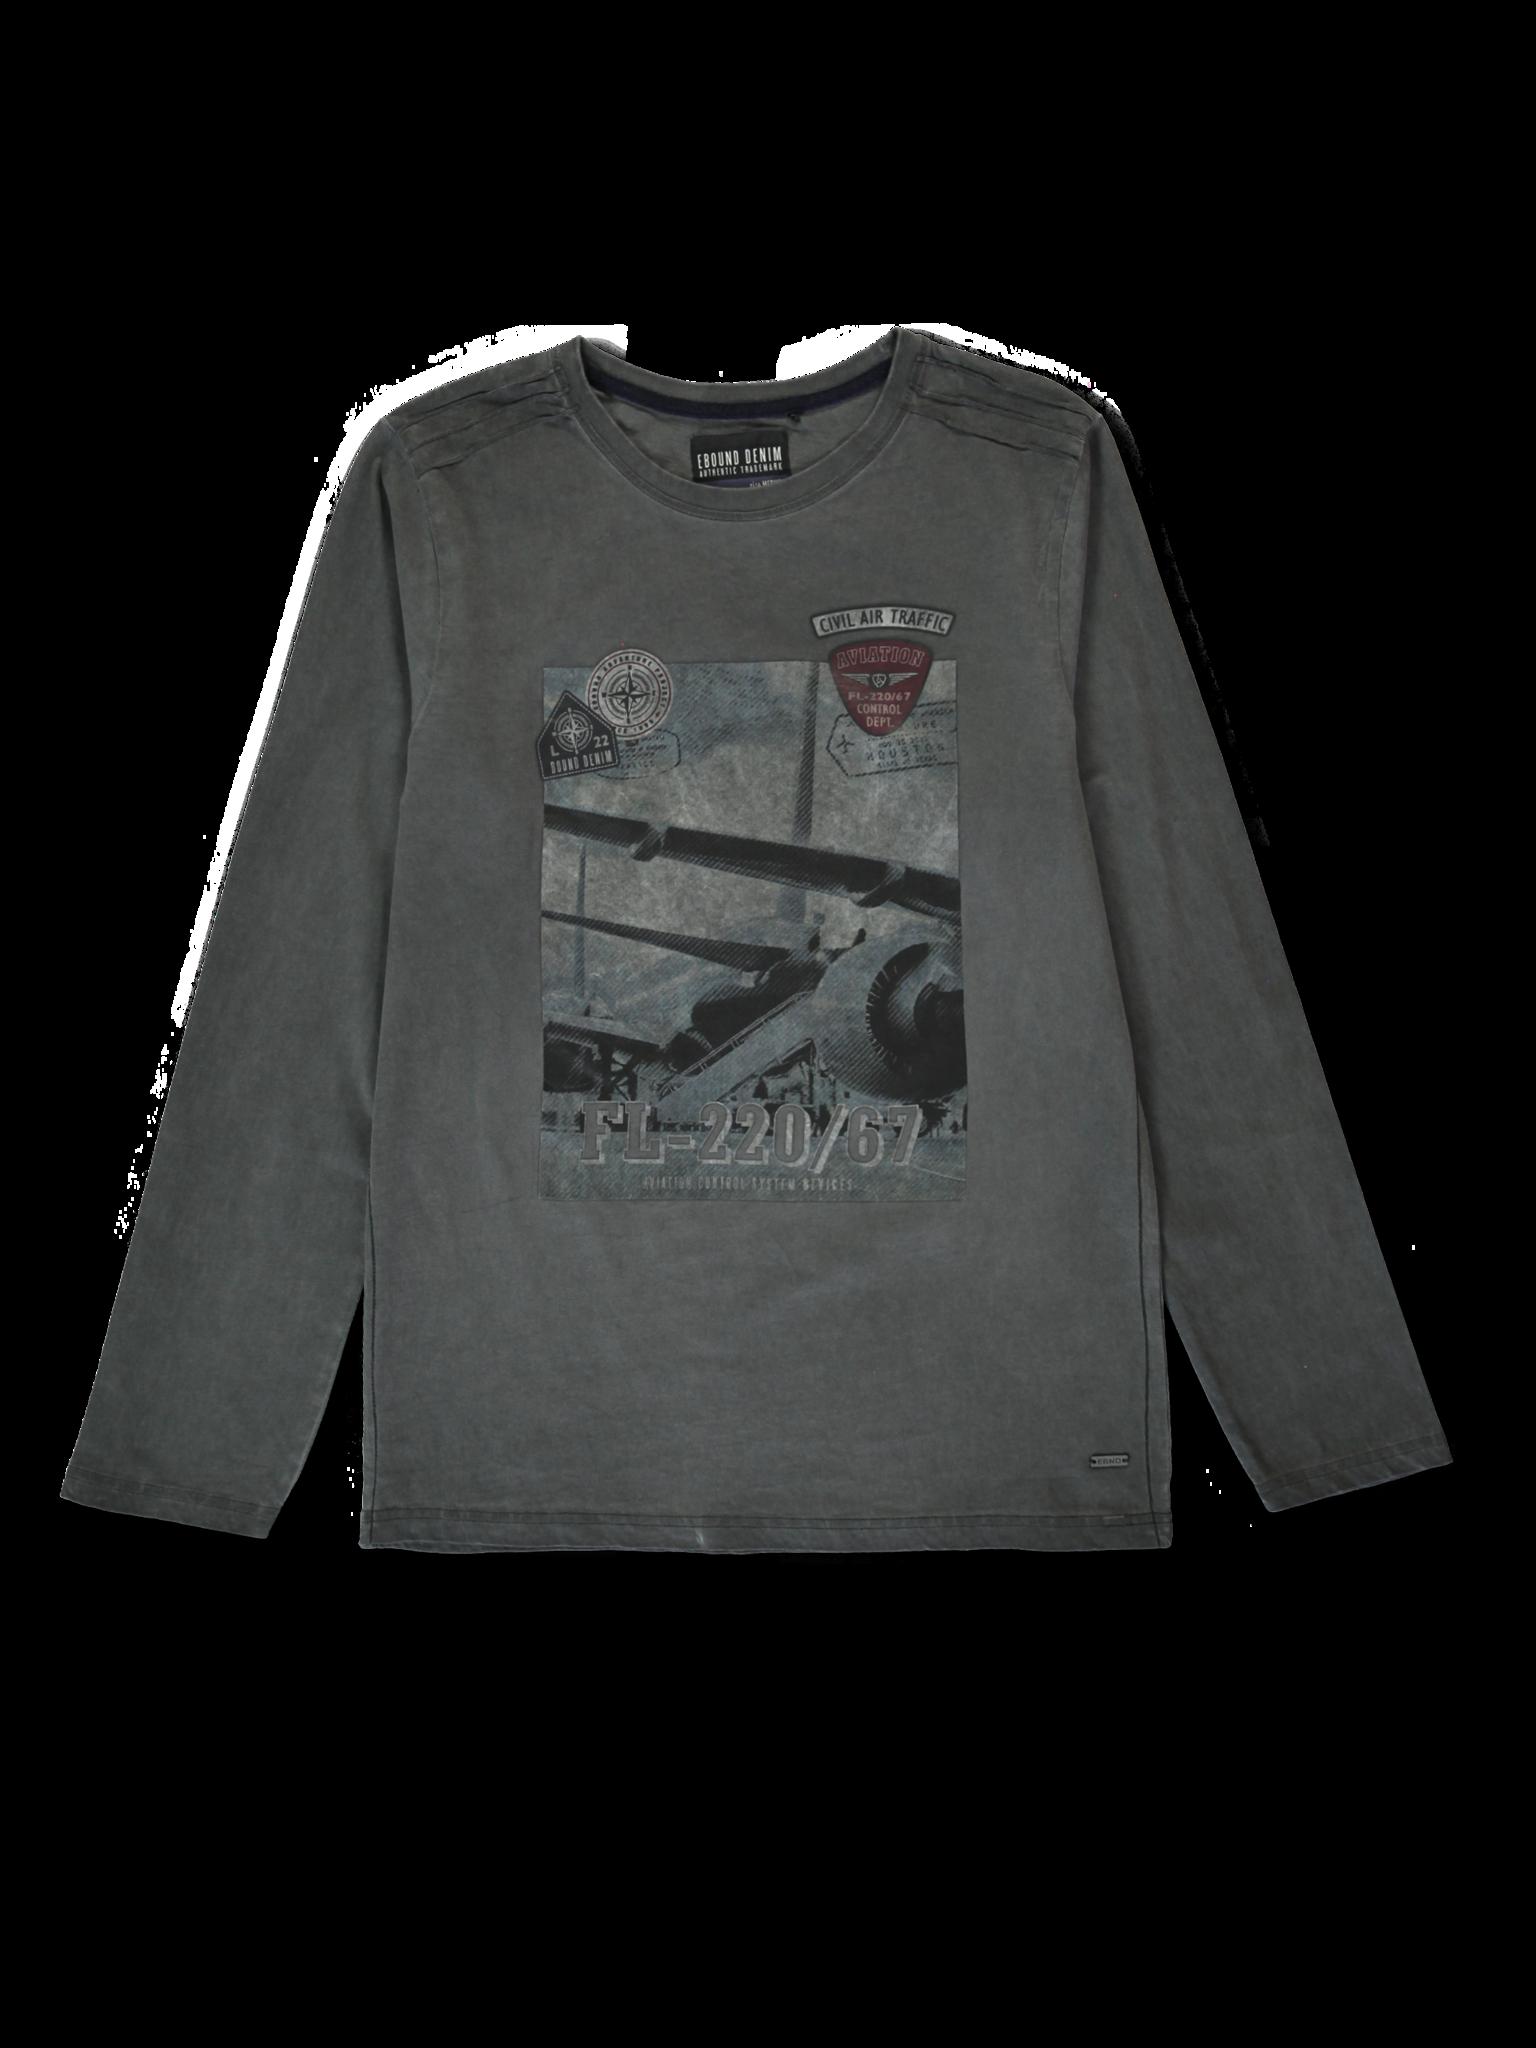 Ebound | Winter 2019 Men | T-shirt | 18 pcs/box